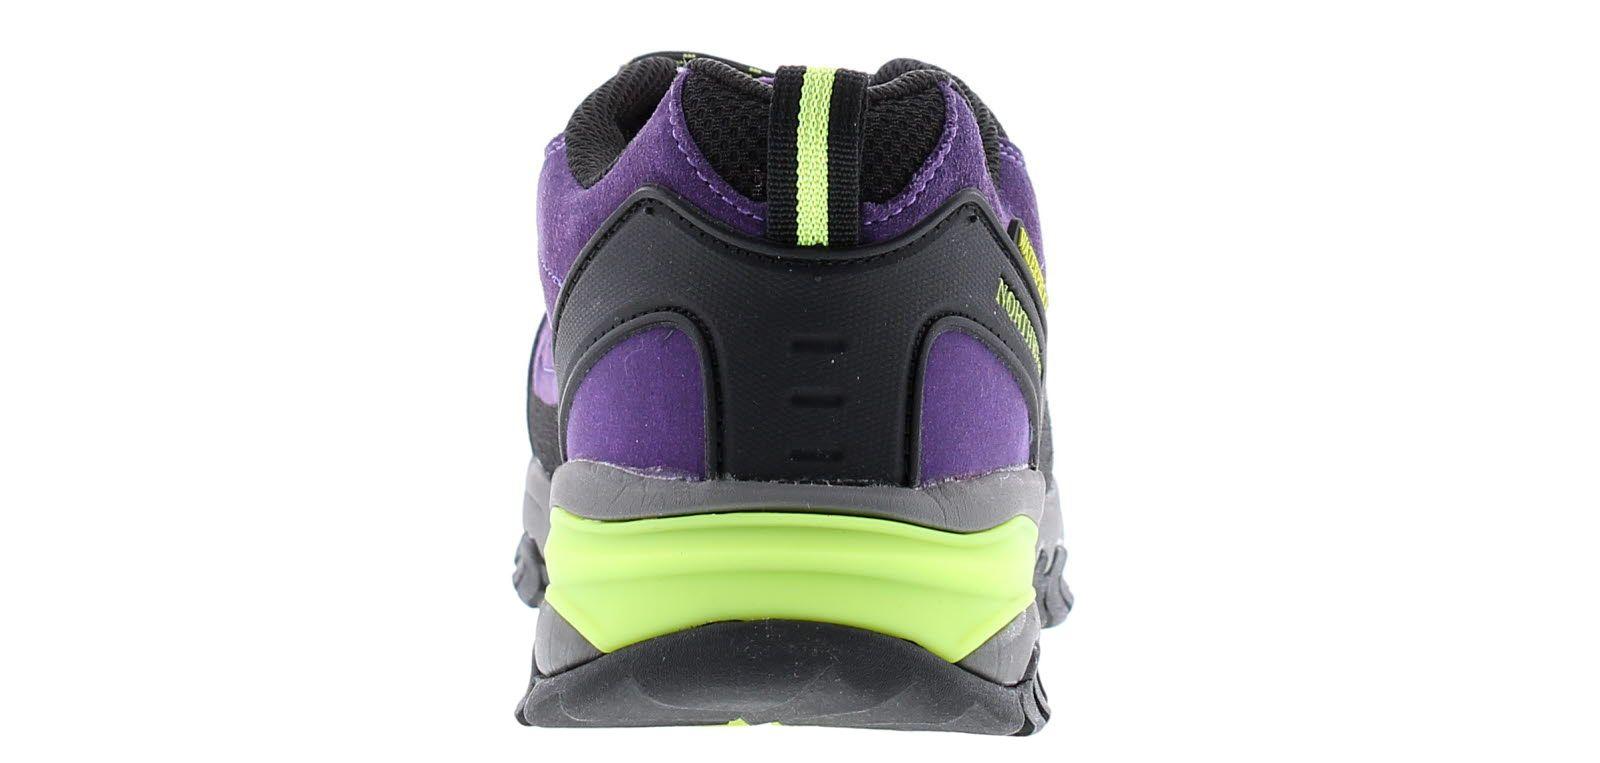 Northwest Territory keele lo leather Womens Waterproof Walking Boots purple